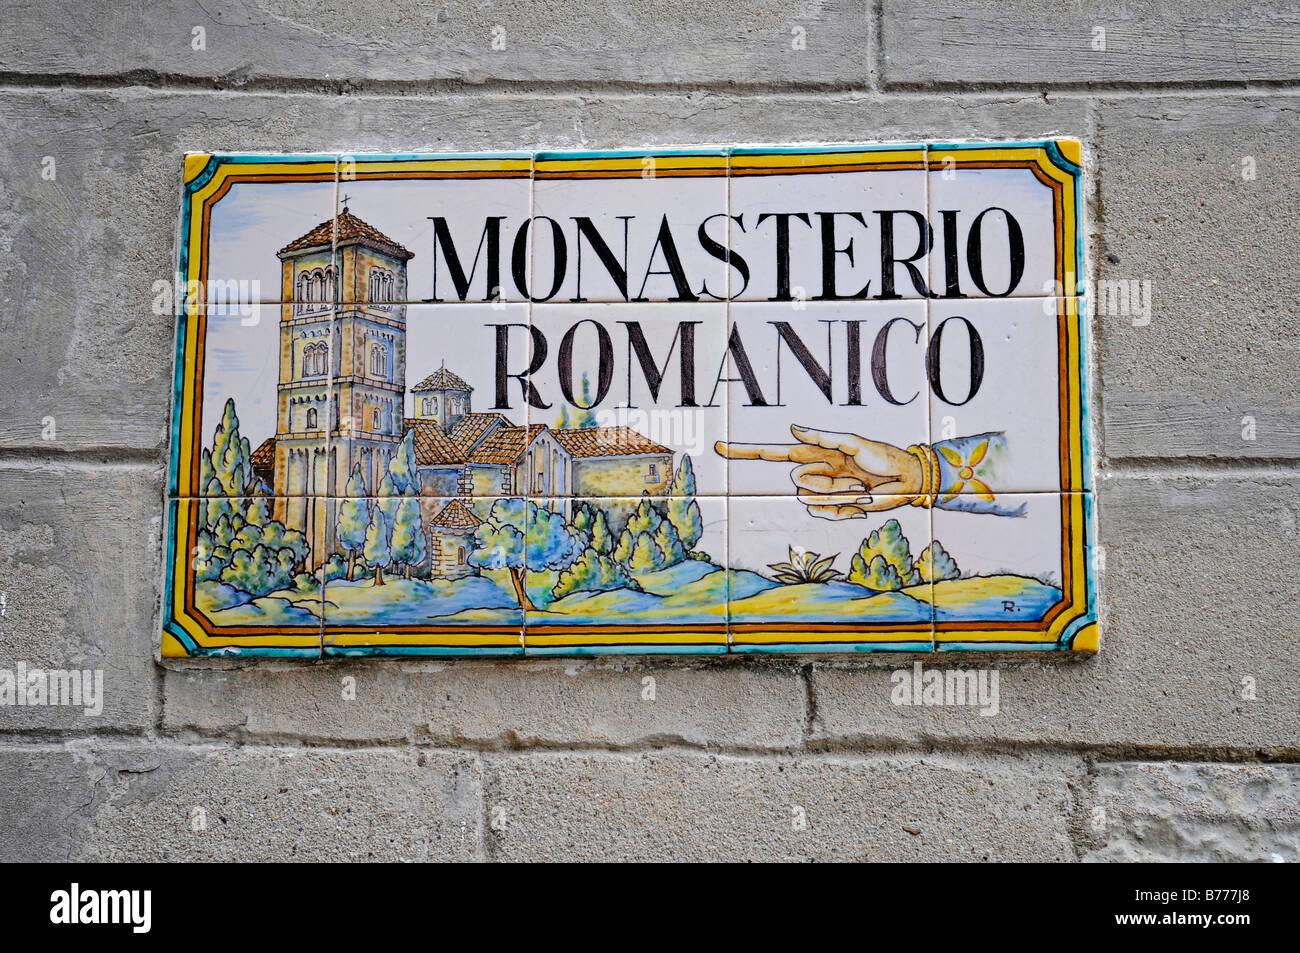 Sign, Spanish tiles, azulejos, Monasterio Romanico, monastery, Poble Espanyol, Spanish village, open-air museum, - Stock Image